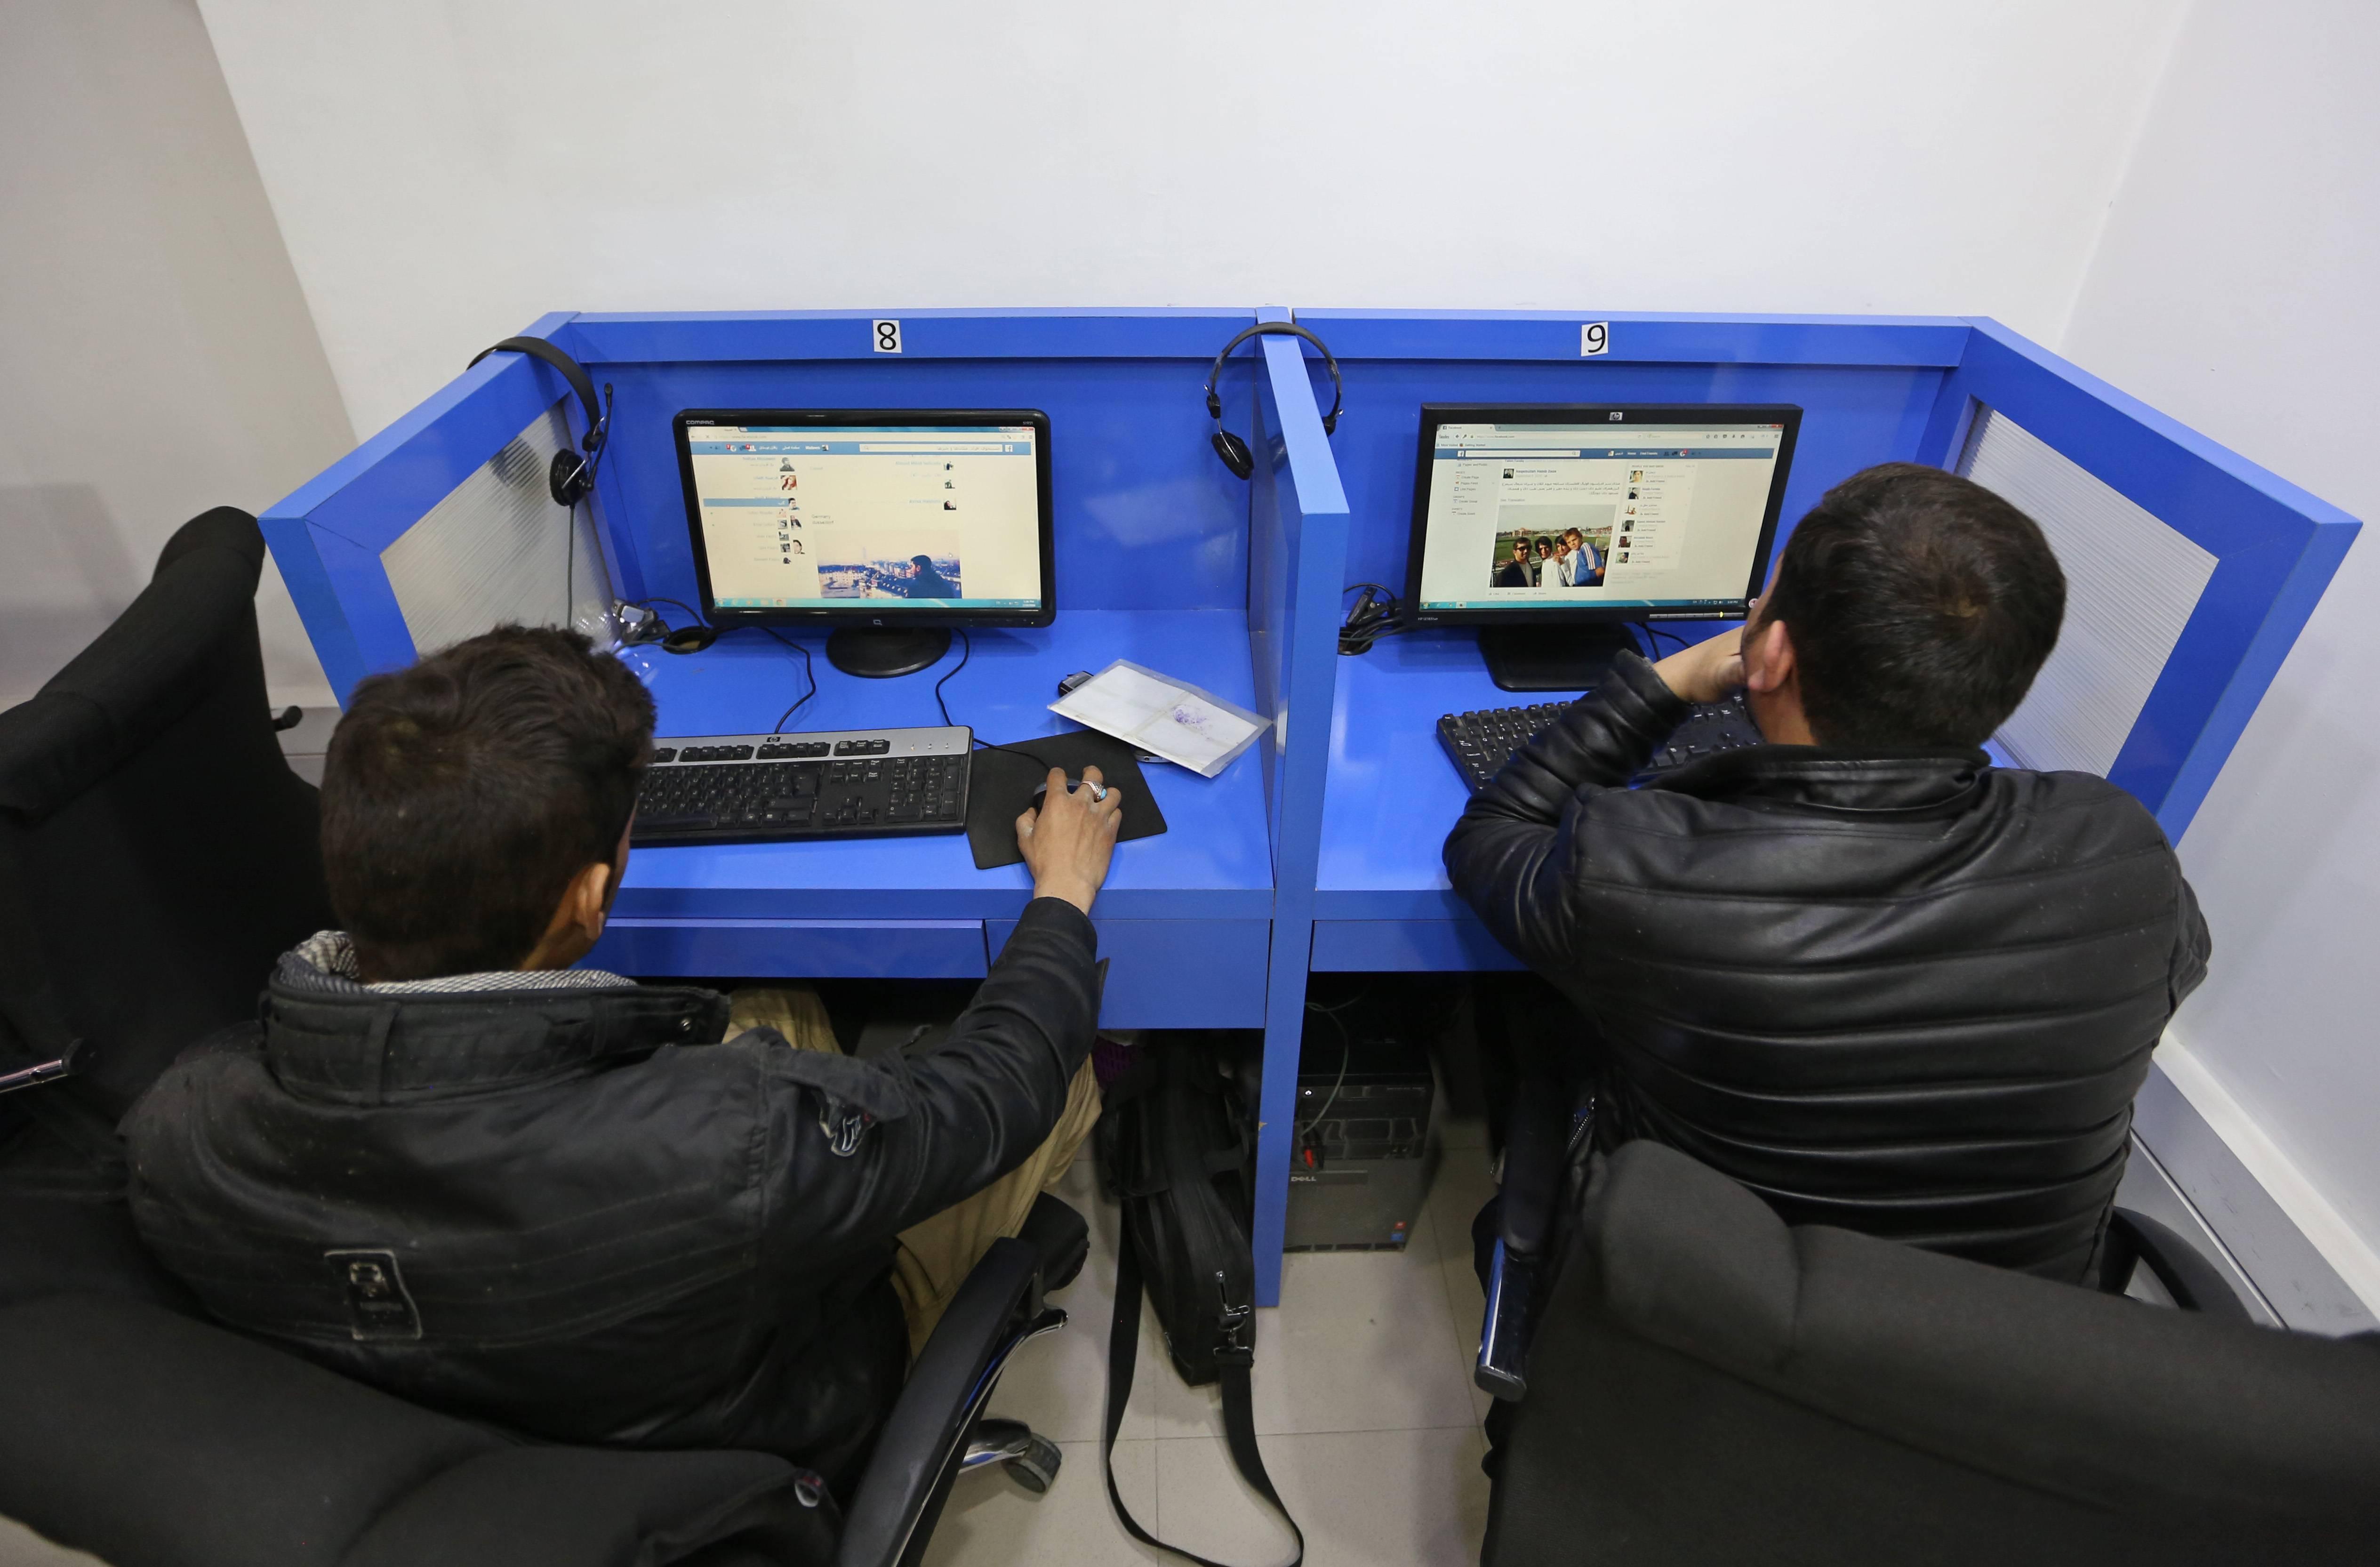 afghanistansocialmepuer-8e614f9c2d82de346c796a152a546ece.jpg